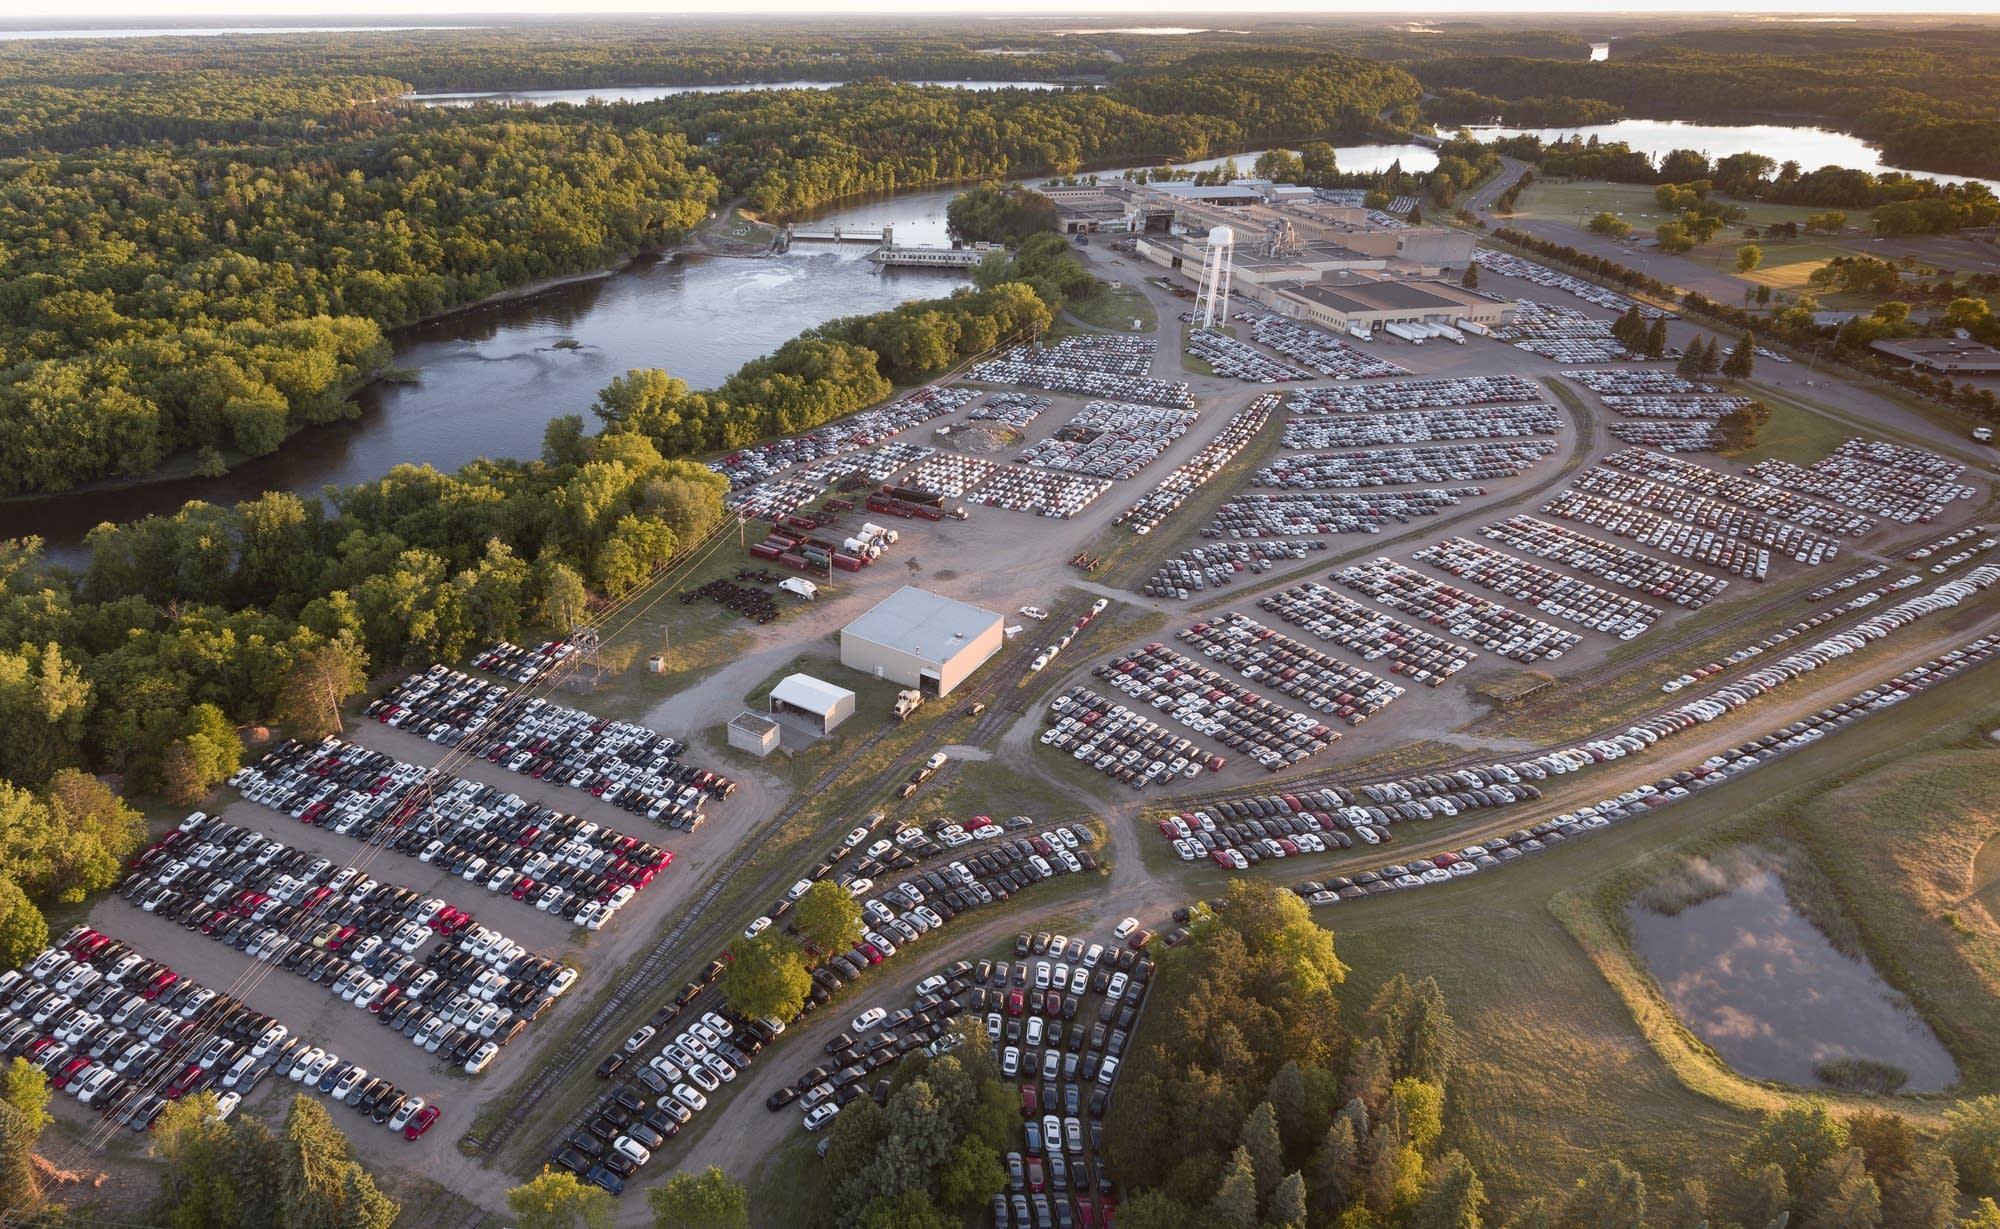 fate  thousands  recalled volkswagens stored  brainerd worries neighbors mpr news